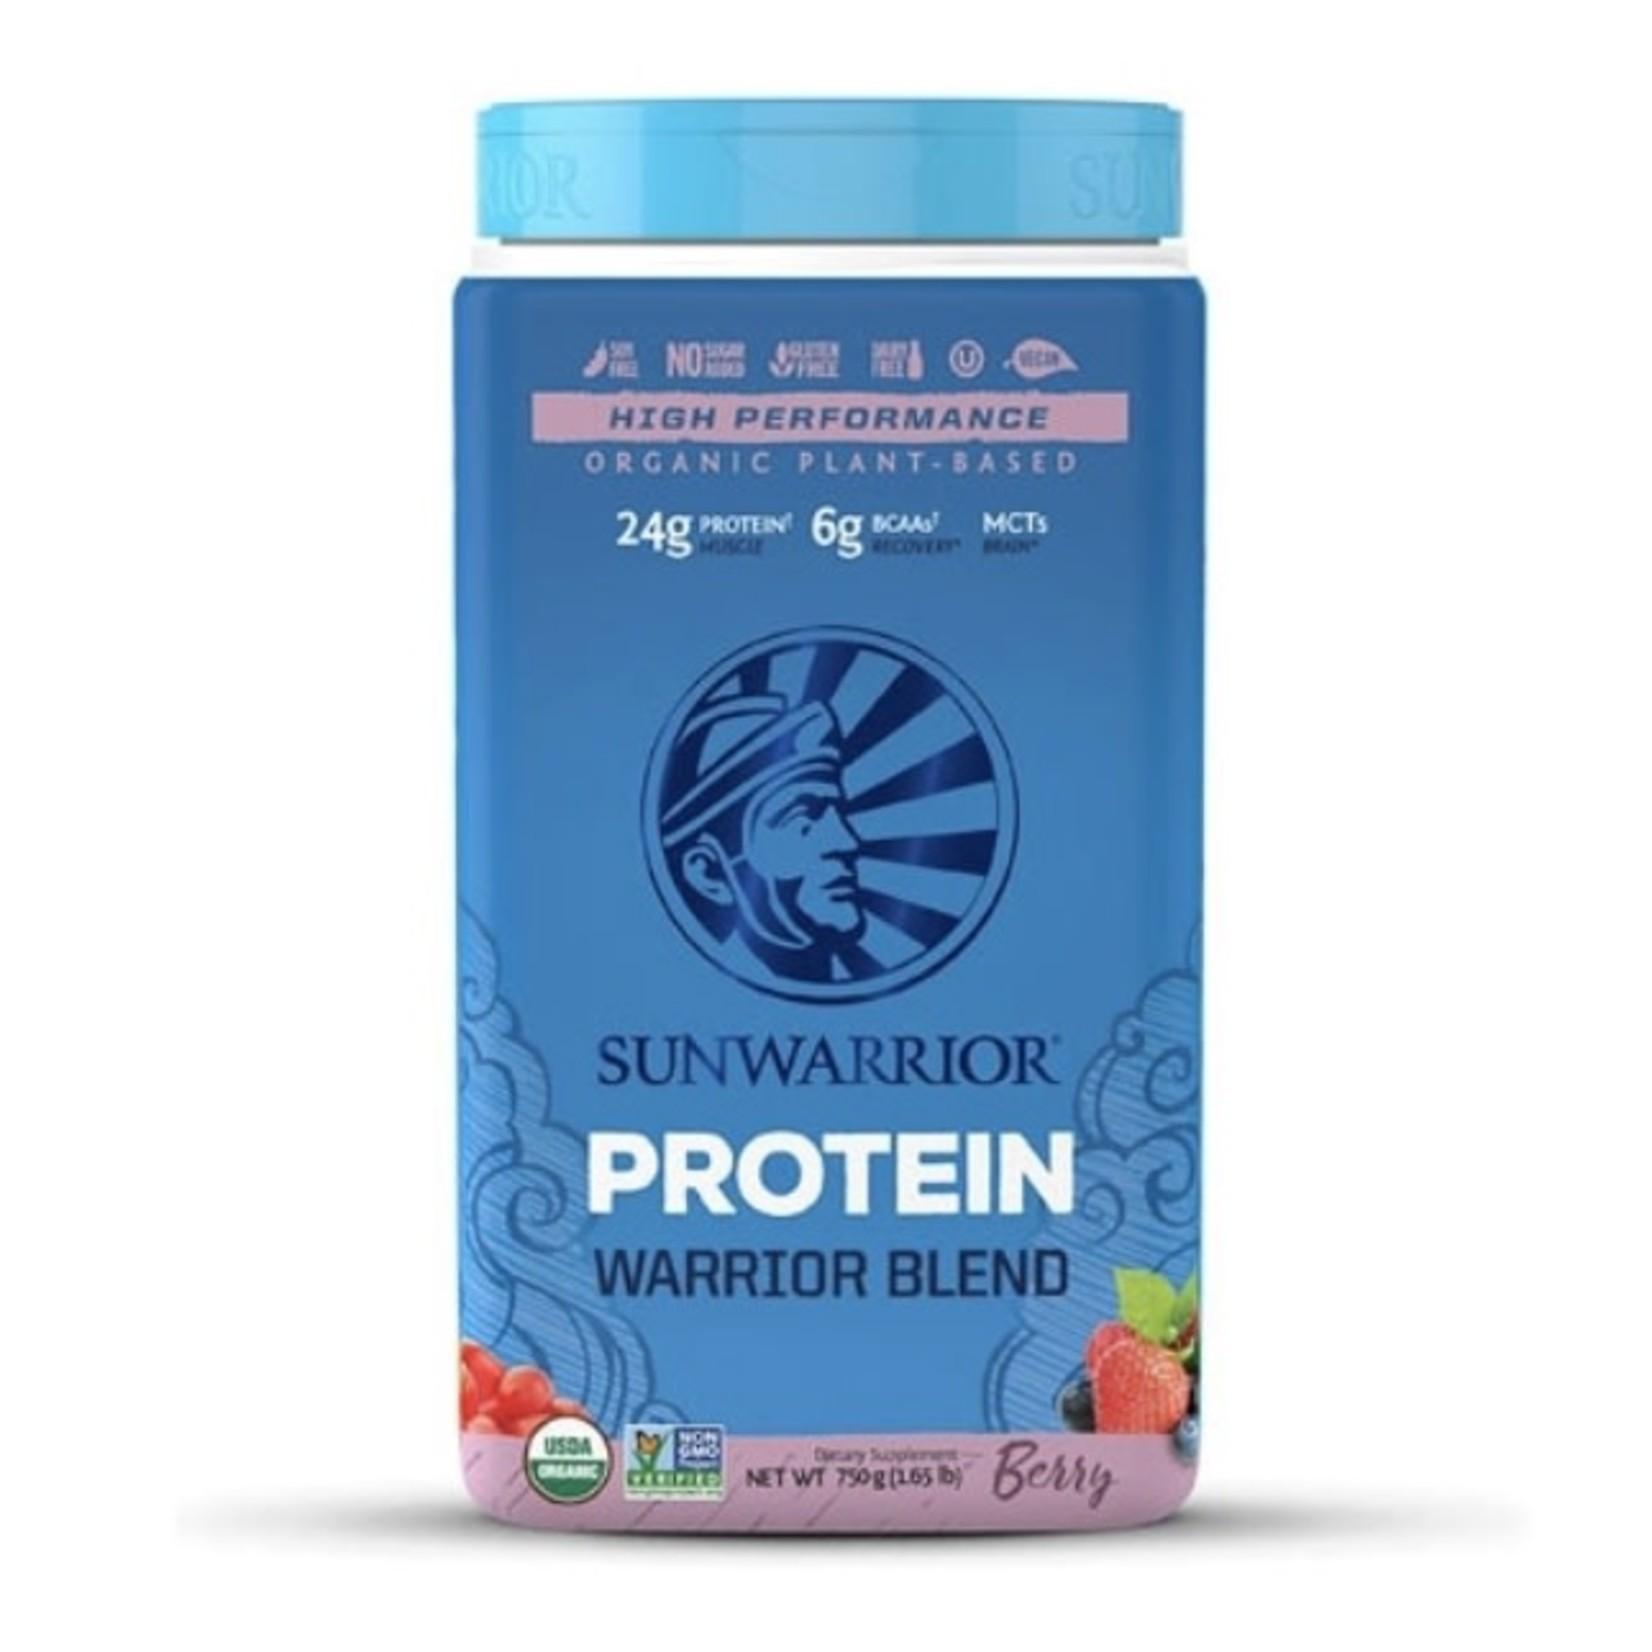 Sunwarrior Sunwarrior Berry Protein 750g